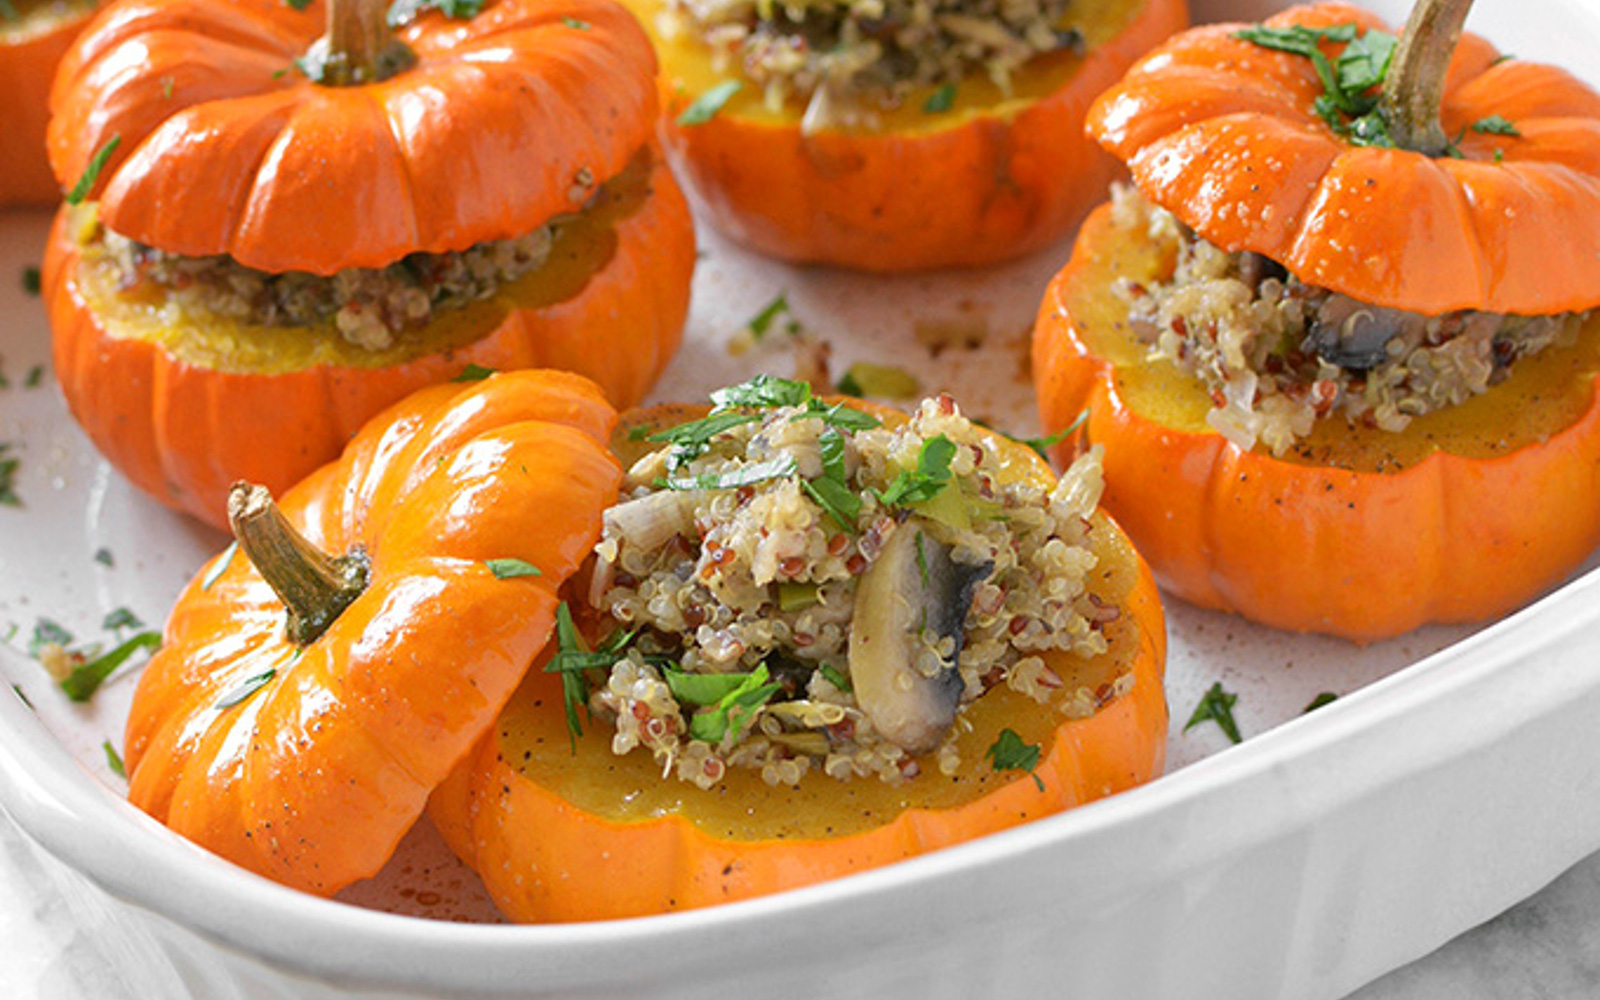 Savory Mushroom and Quinoa Stuffed Mini Pumpkins